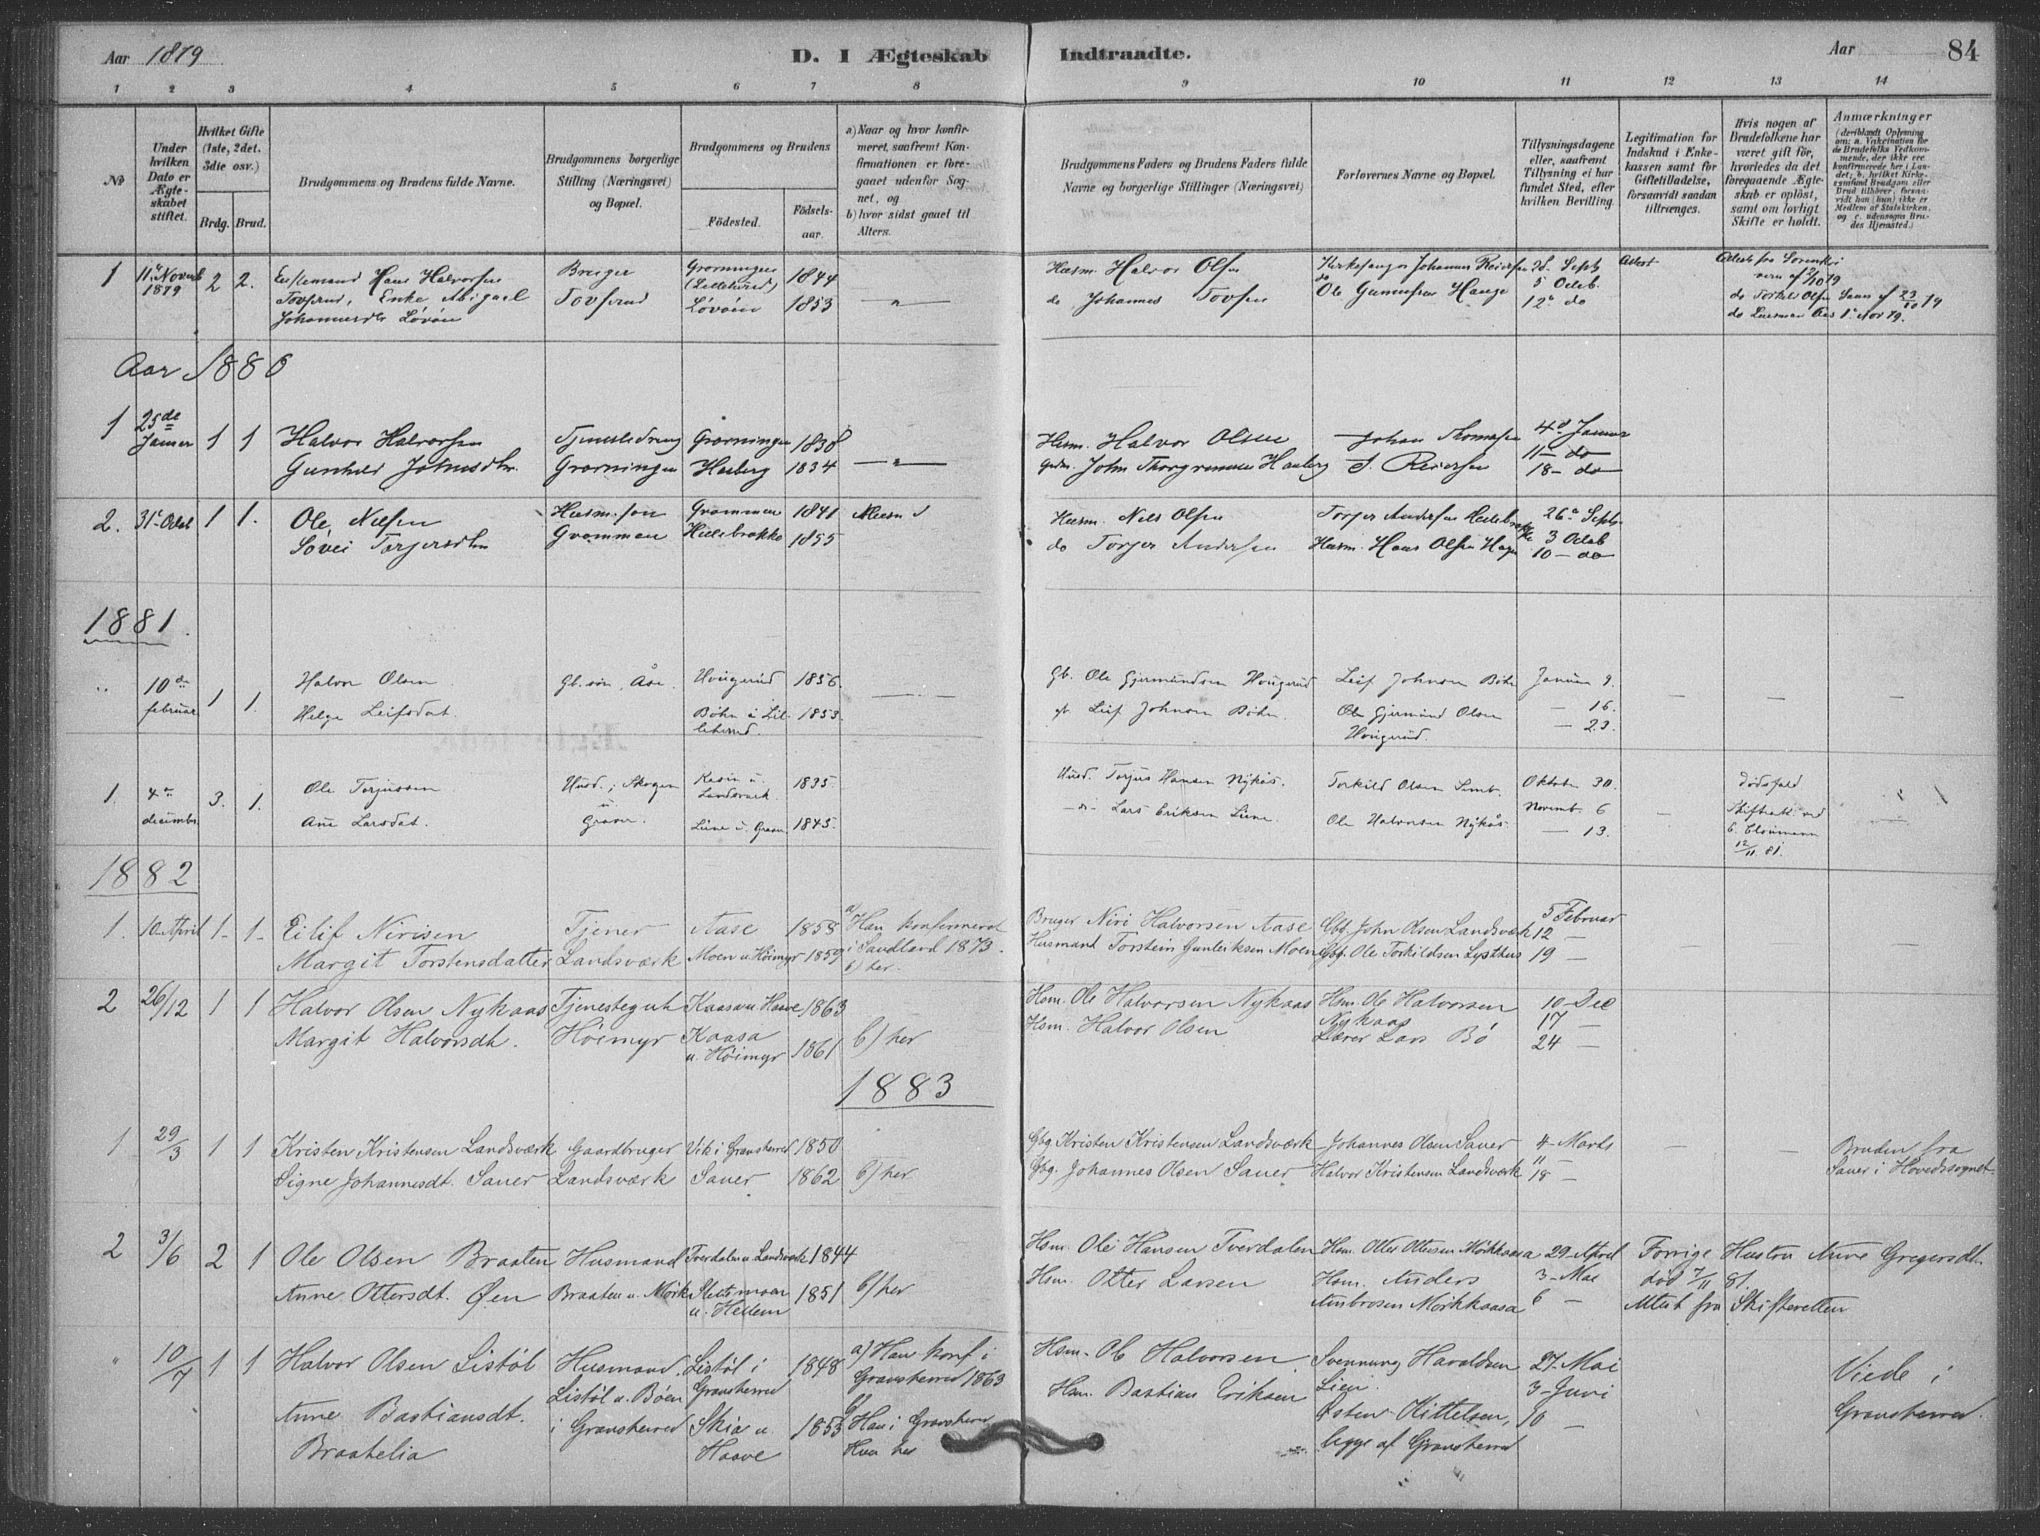 SAKO, Heddal kirkebøker, F/Fb/L0002: Ministerialbok nr. II 2, 1878-1913, s. 84